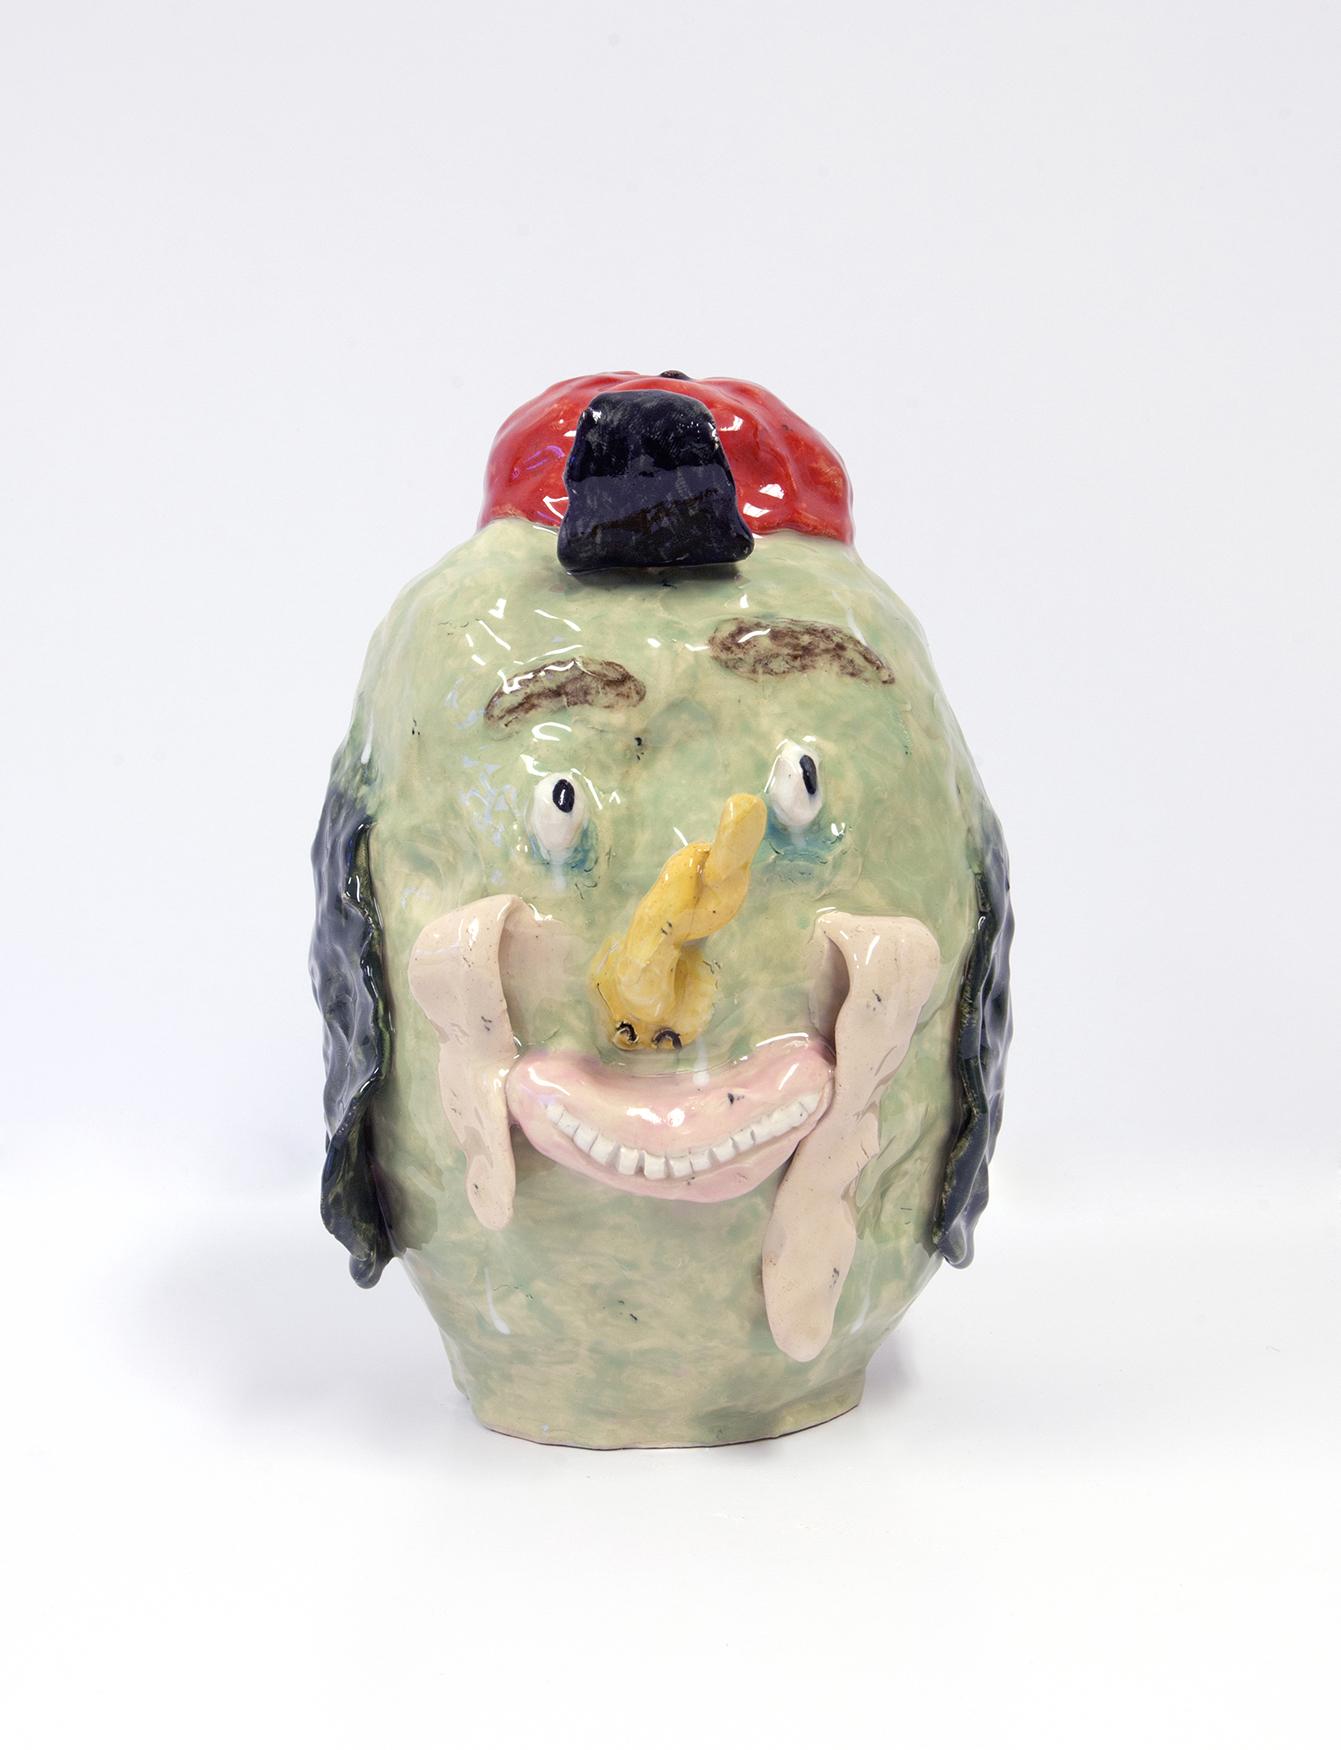 Joakim Ojanen, Loop Nose, 2017, stoneware, h: 24 cm